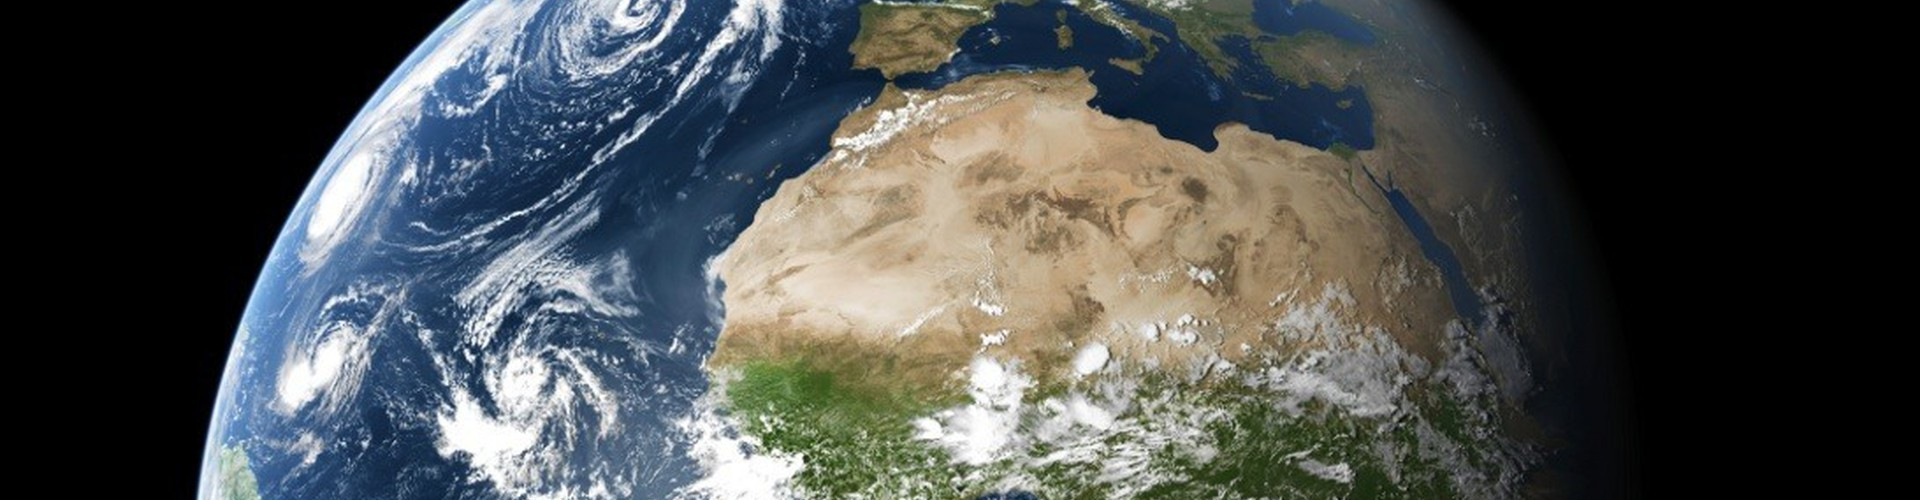 Hurricane season 2010 as seen from a satellite (Credit: Maximilian Reuter, distributed via imaggeo.egu.eu)